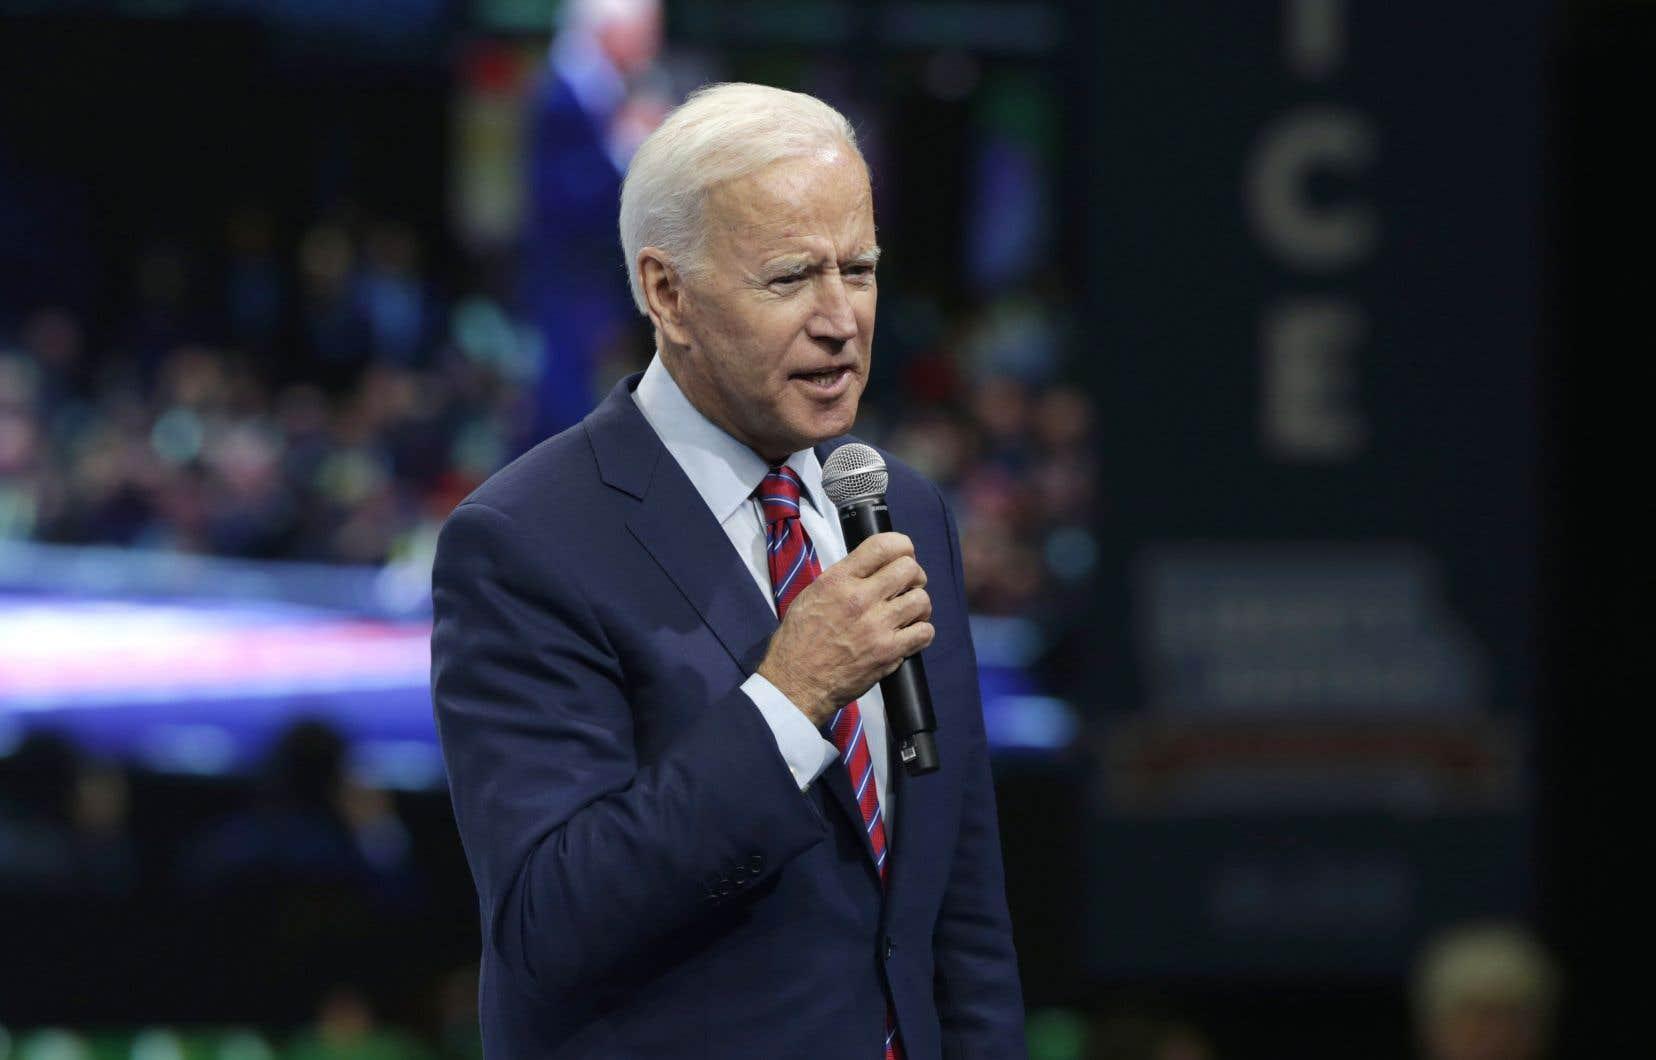 Le candidat à l'investiture démocrate Joe Biden